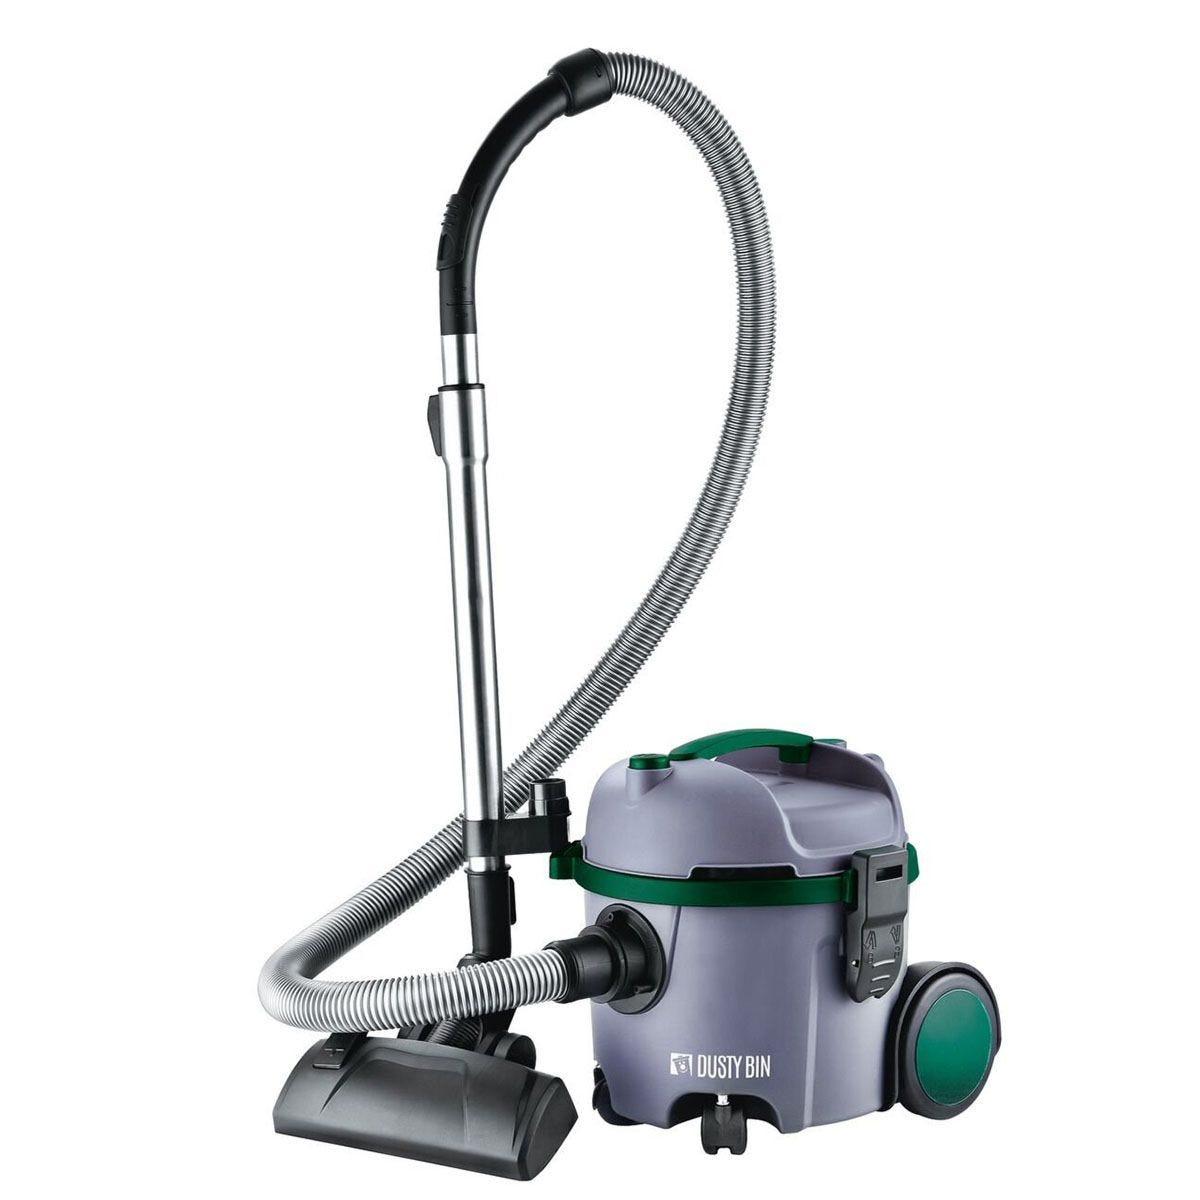 Dusty Bin Bagless Compact Lite Vacuum Cleaner - Grey